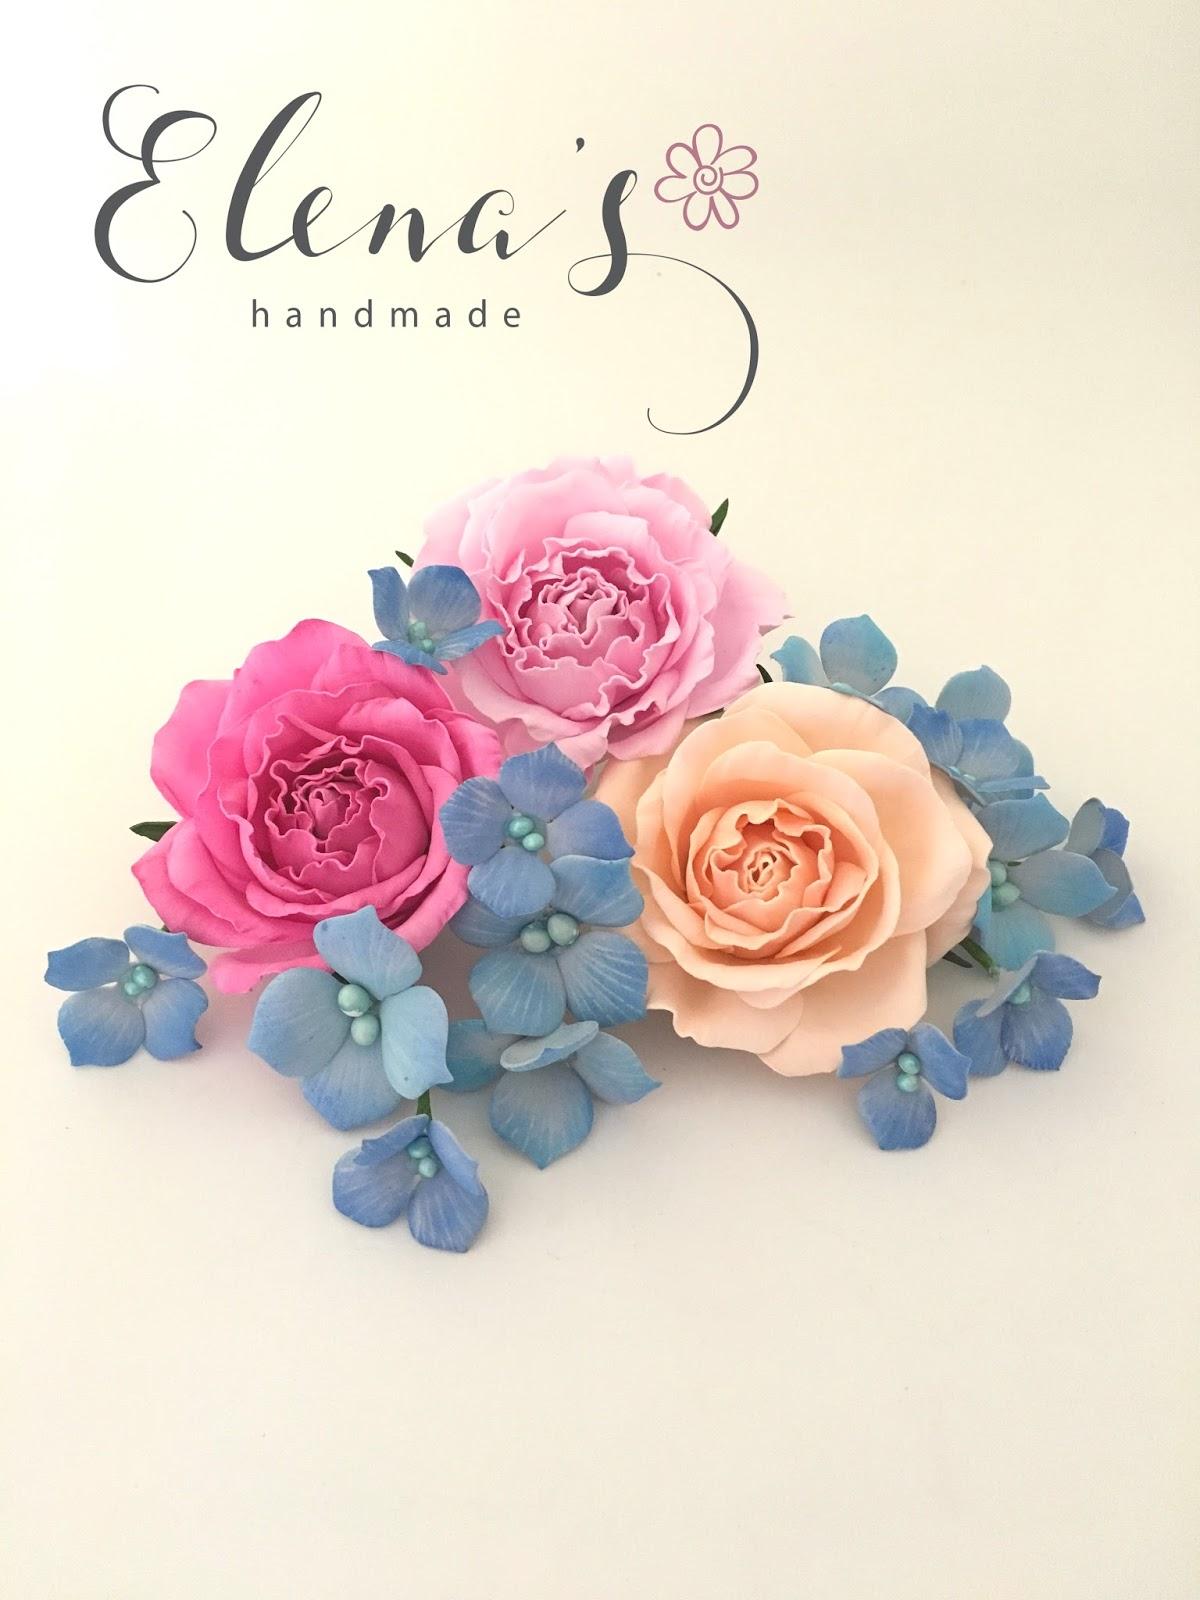 Elenas Handmade Forget Me Not Flowers Roses Arrangement